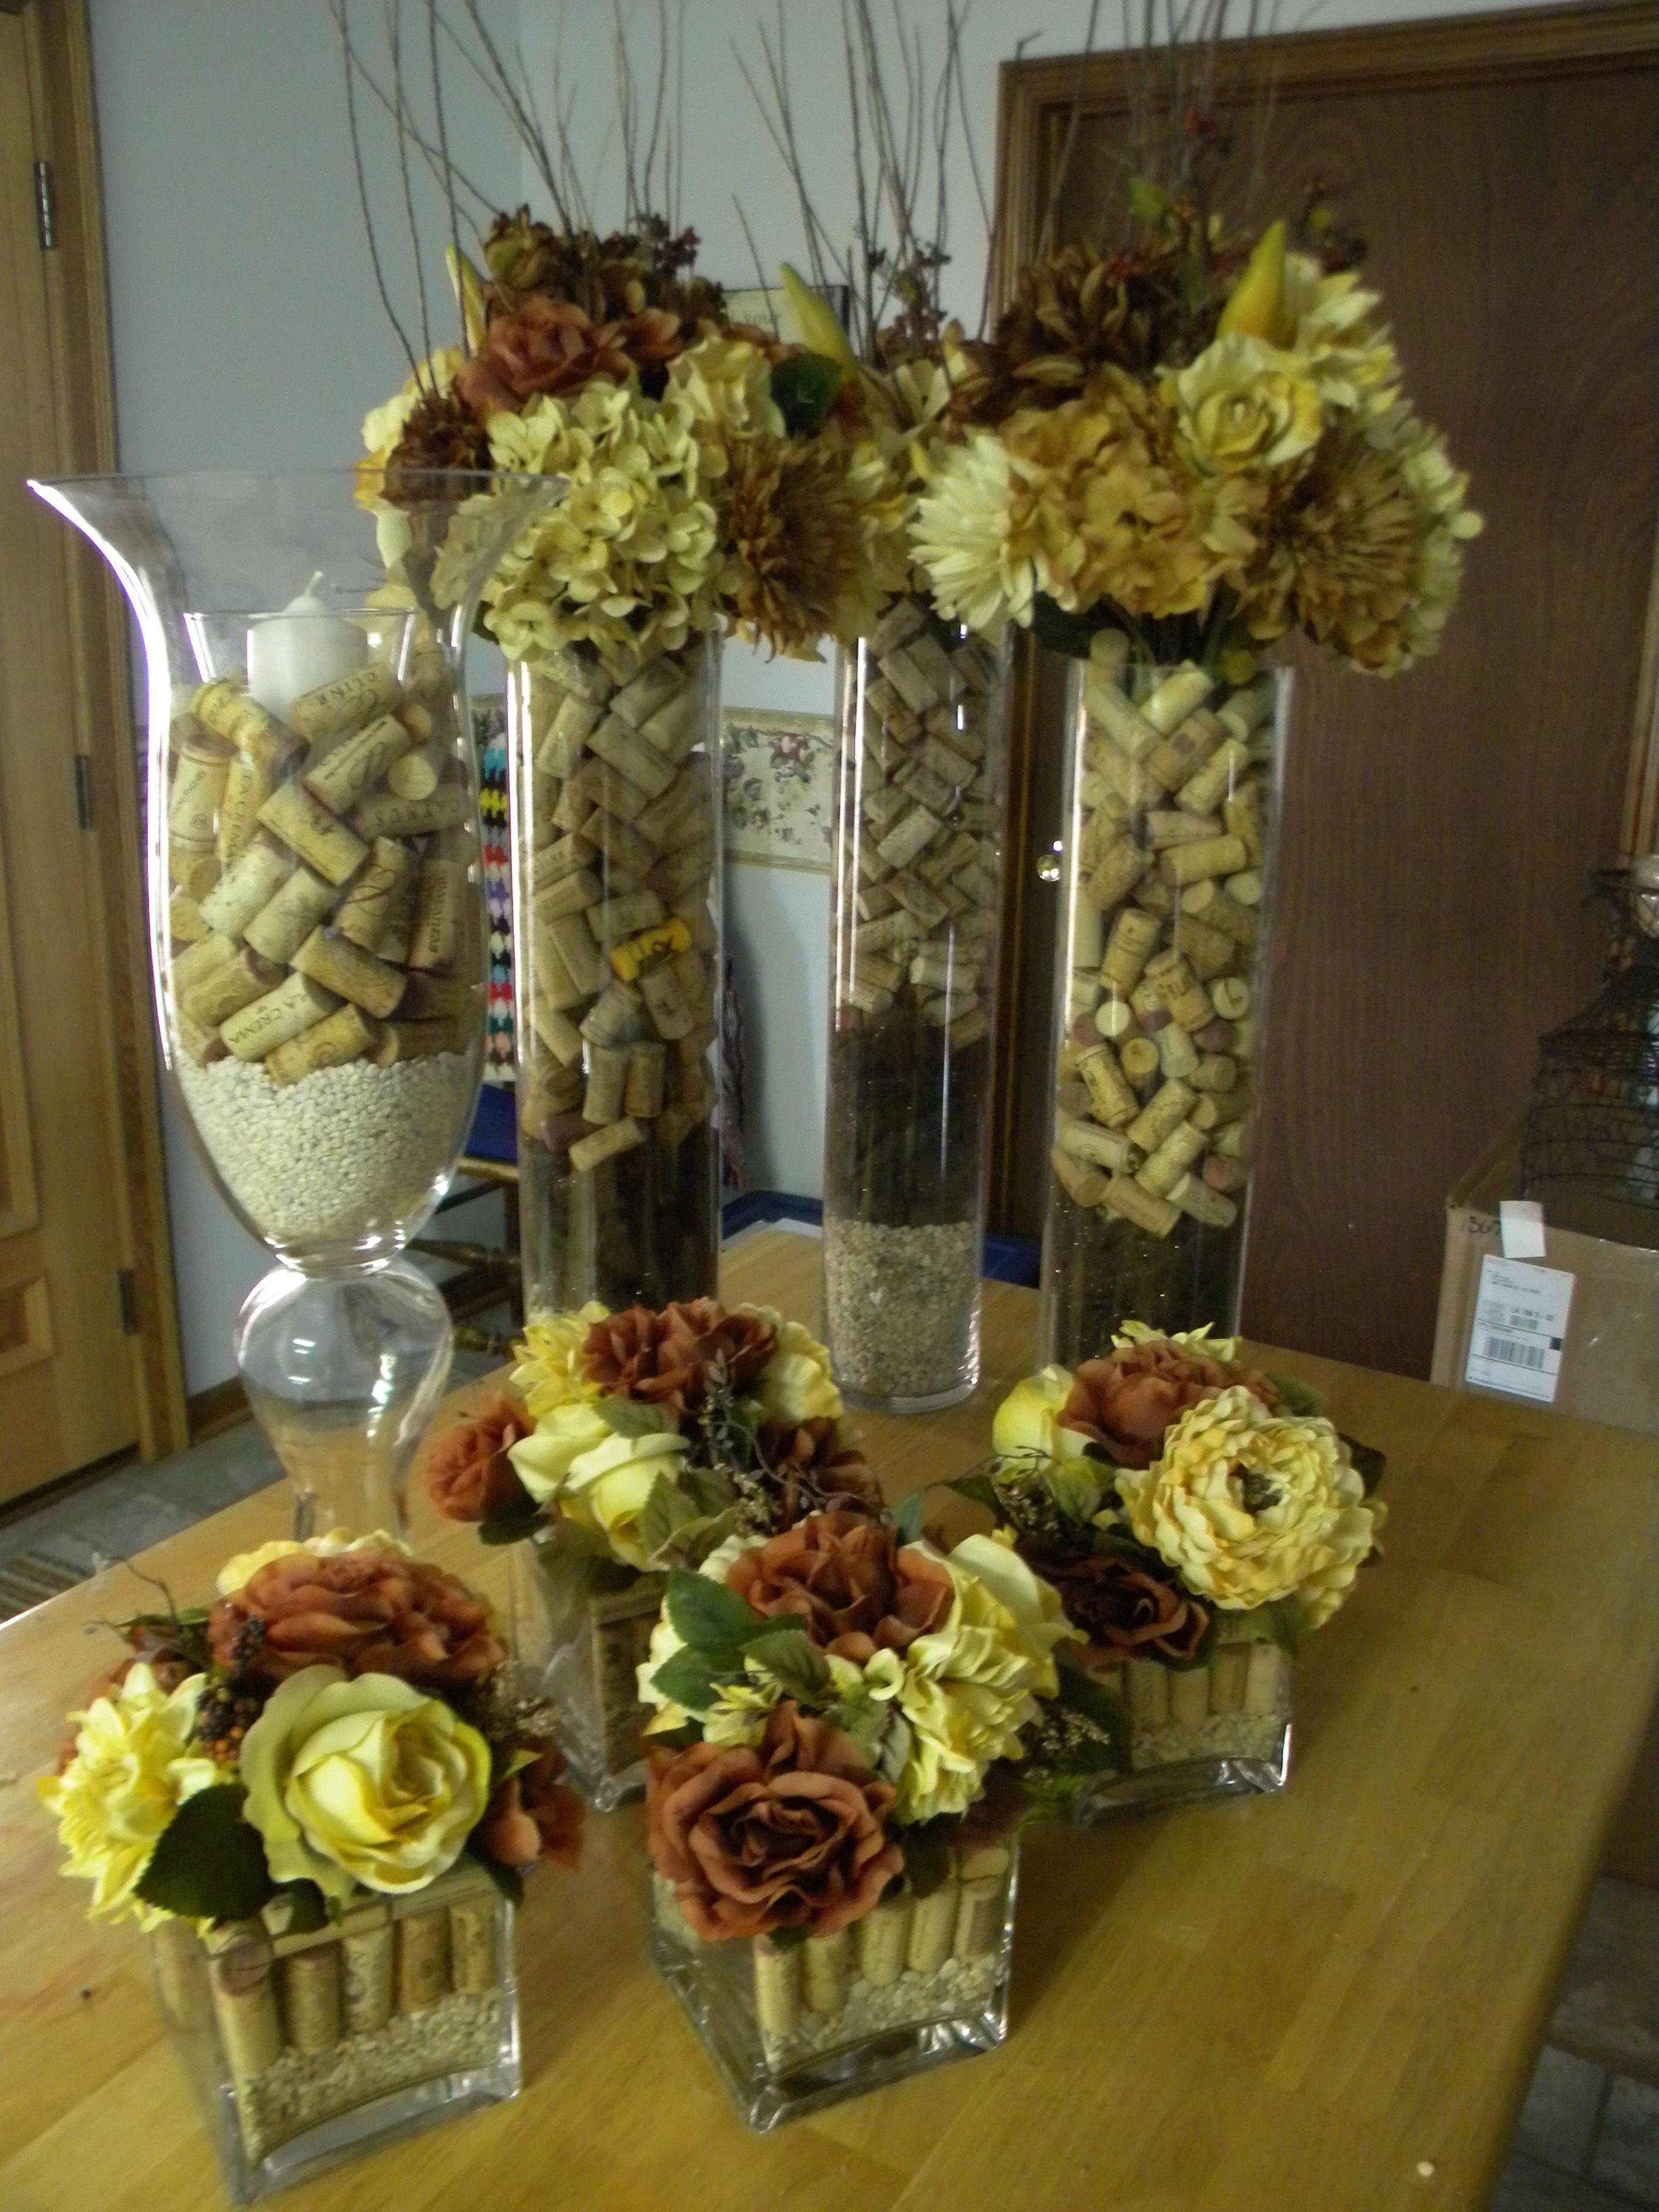 wine cork for weddingbut with purple hydrageneas instead